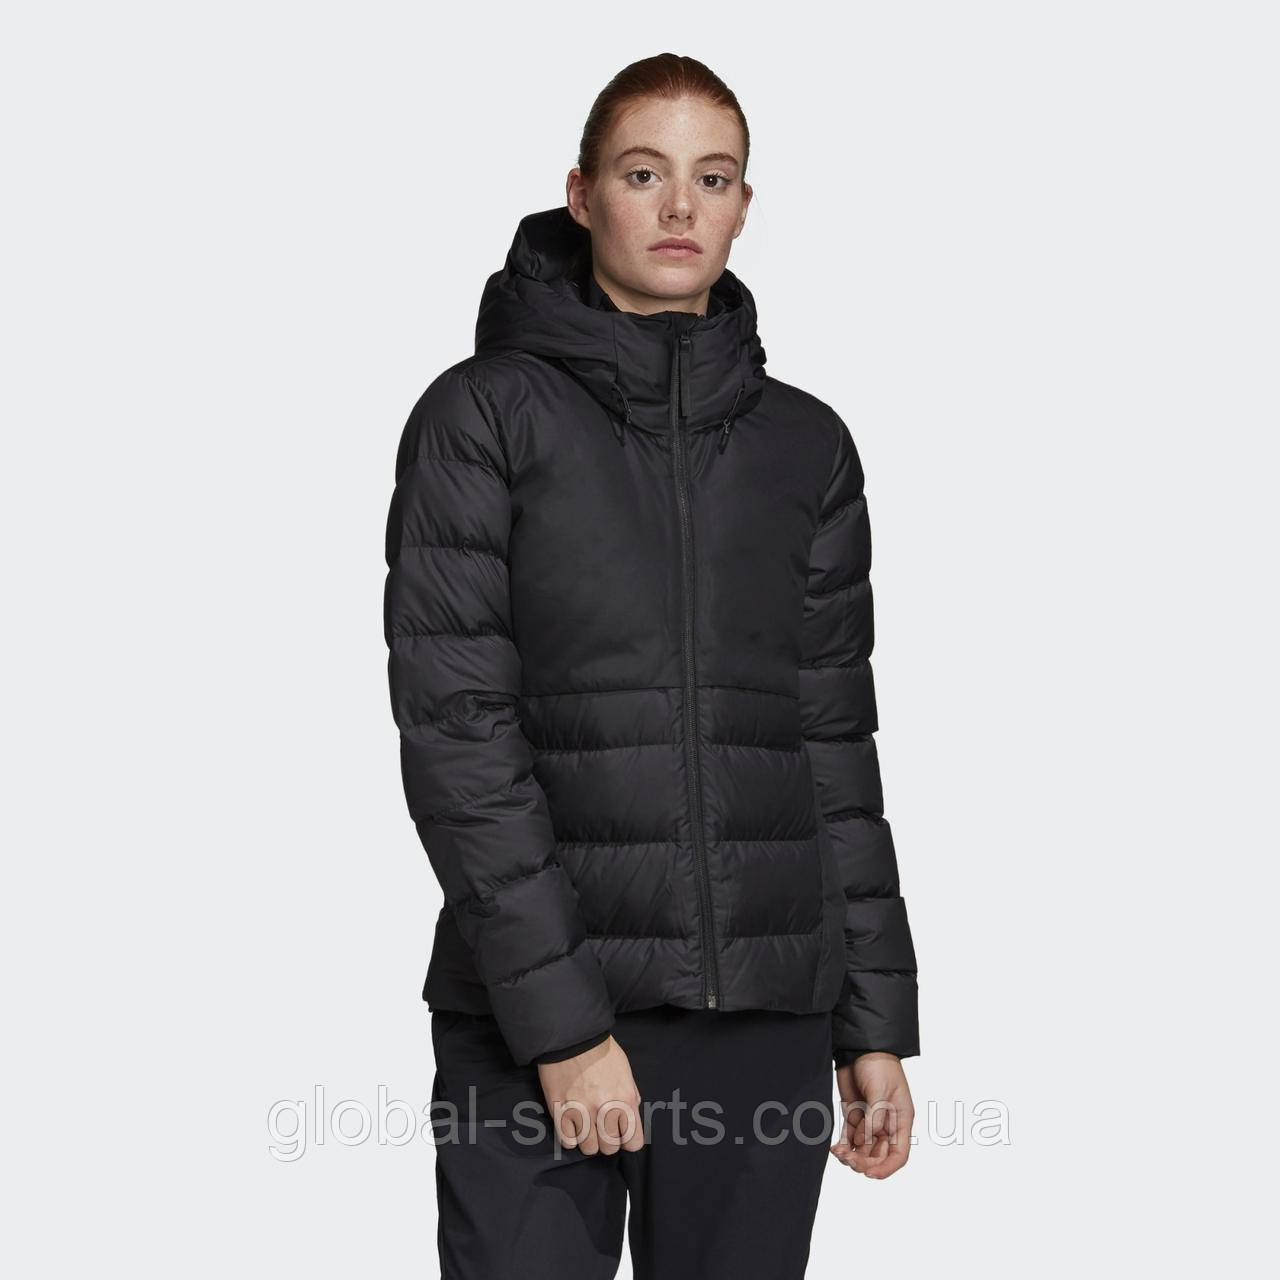 Женская куртка-пуховик Adidas Urban COLD.RDY W (Артикул:FT2510)